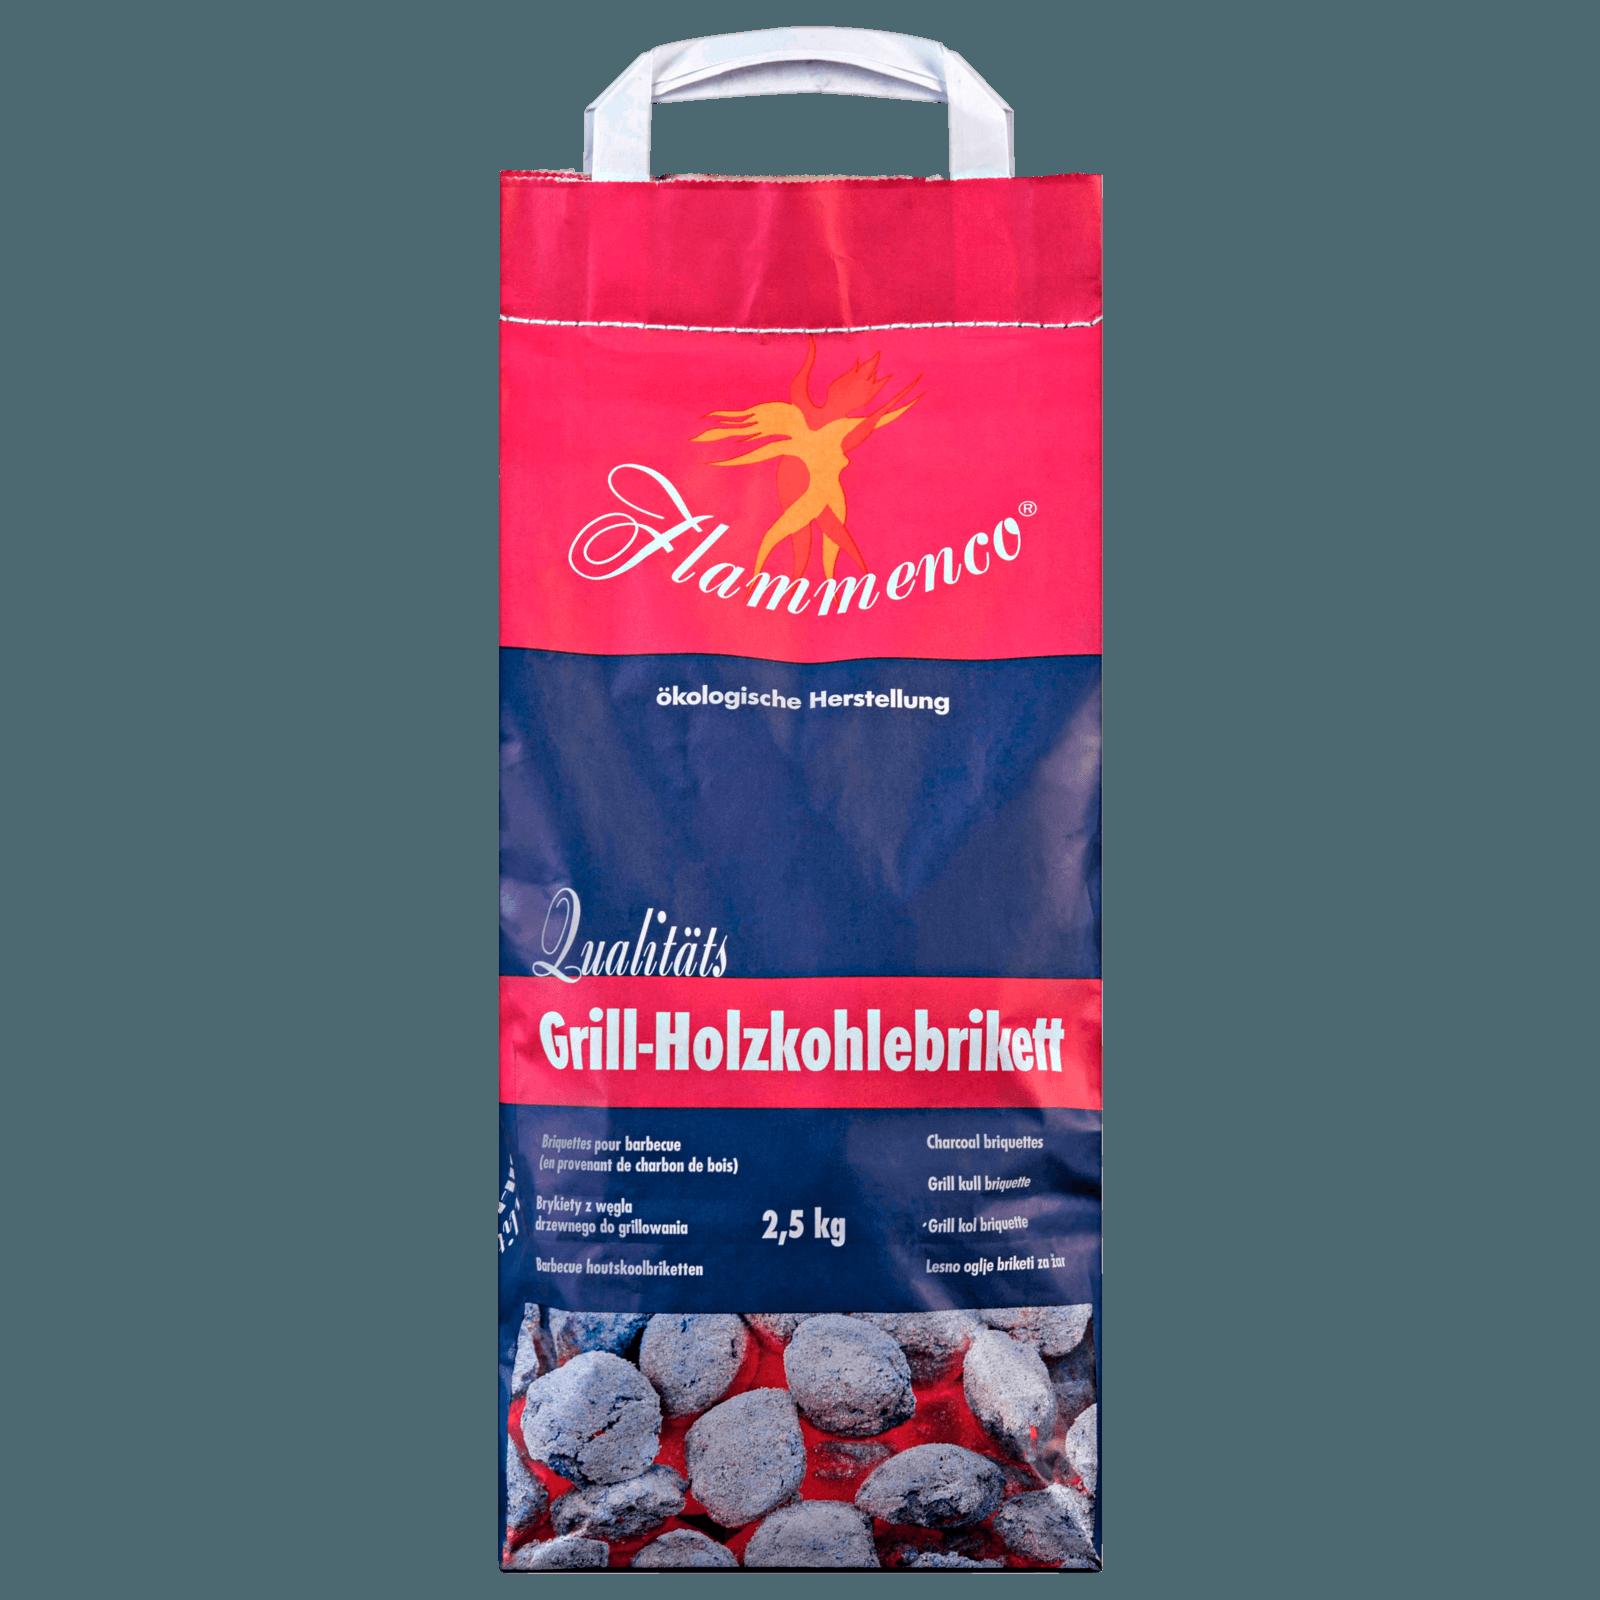 Flammenco Grillbriketts 2,5kg